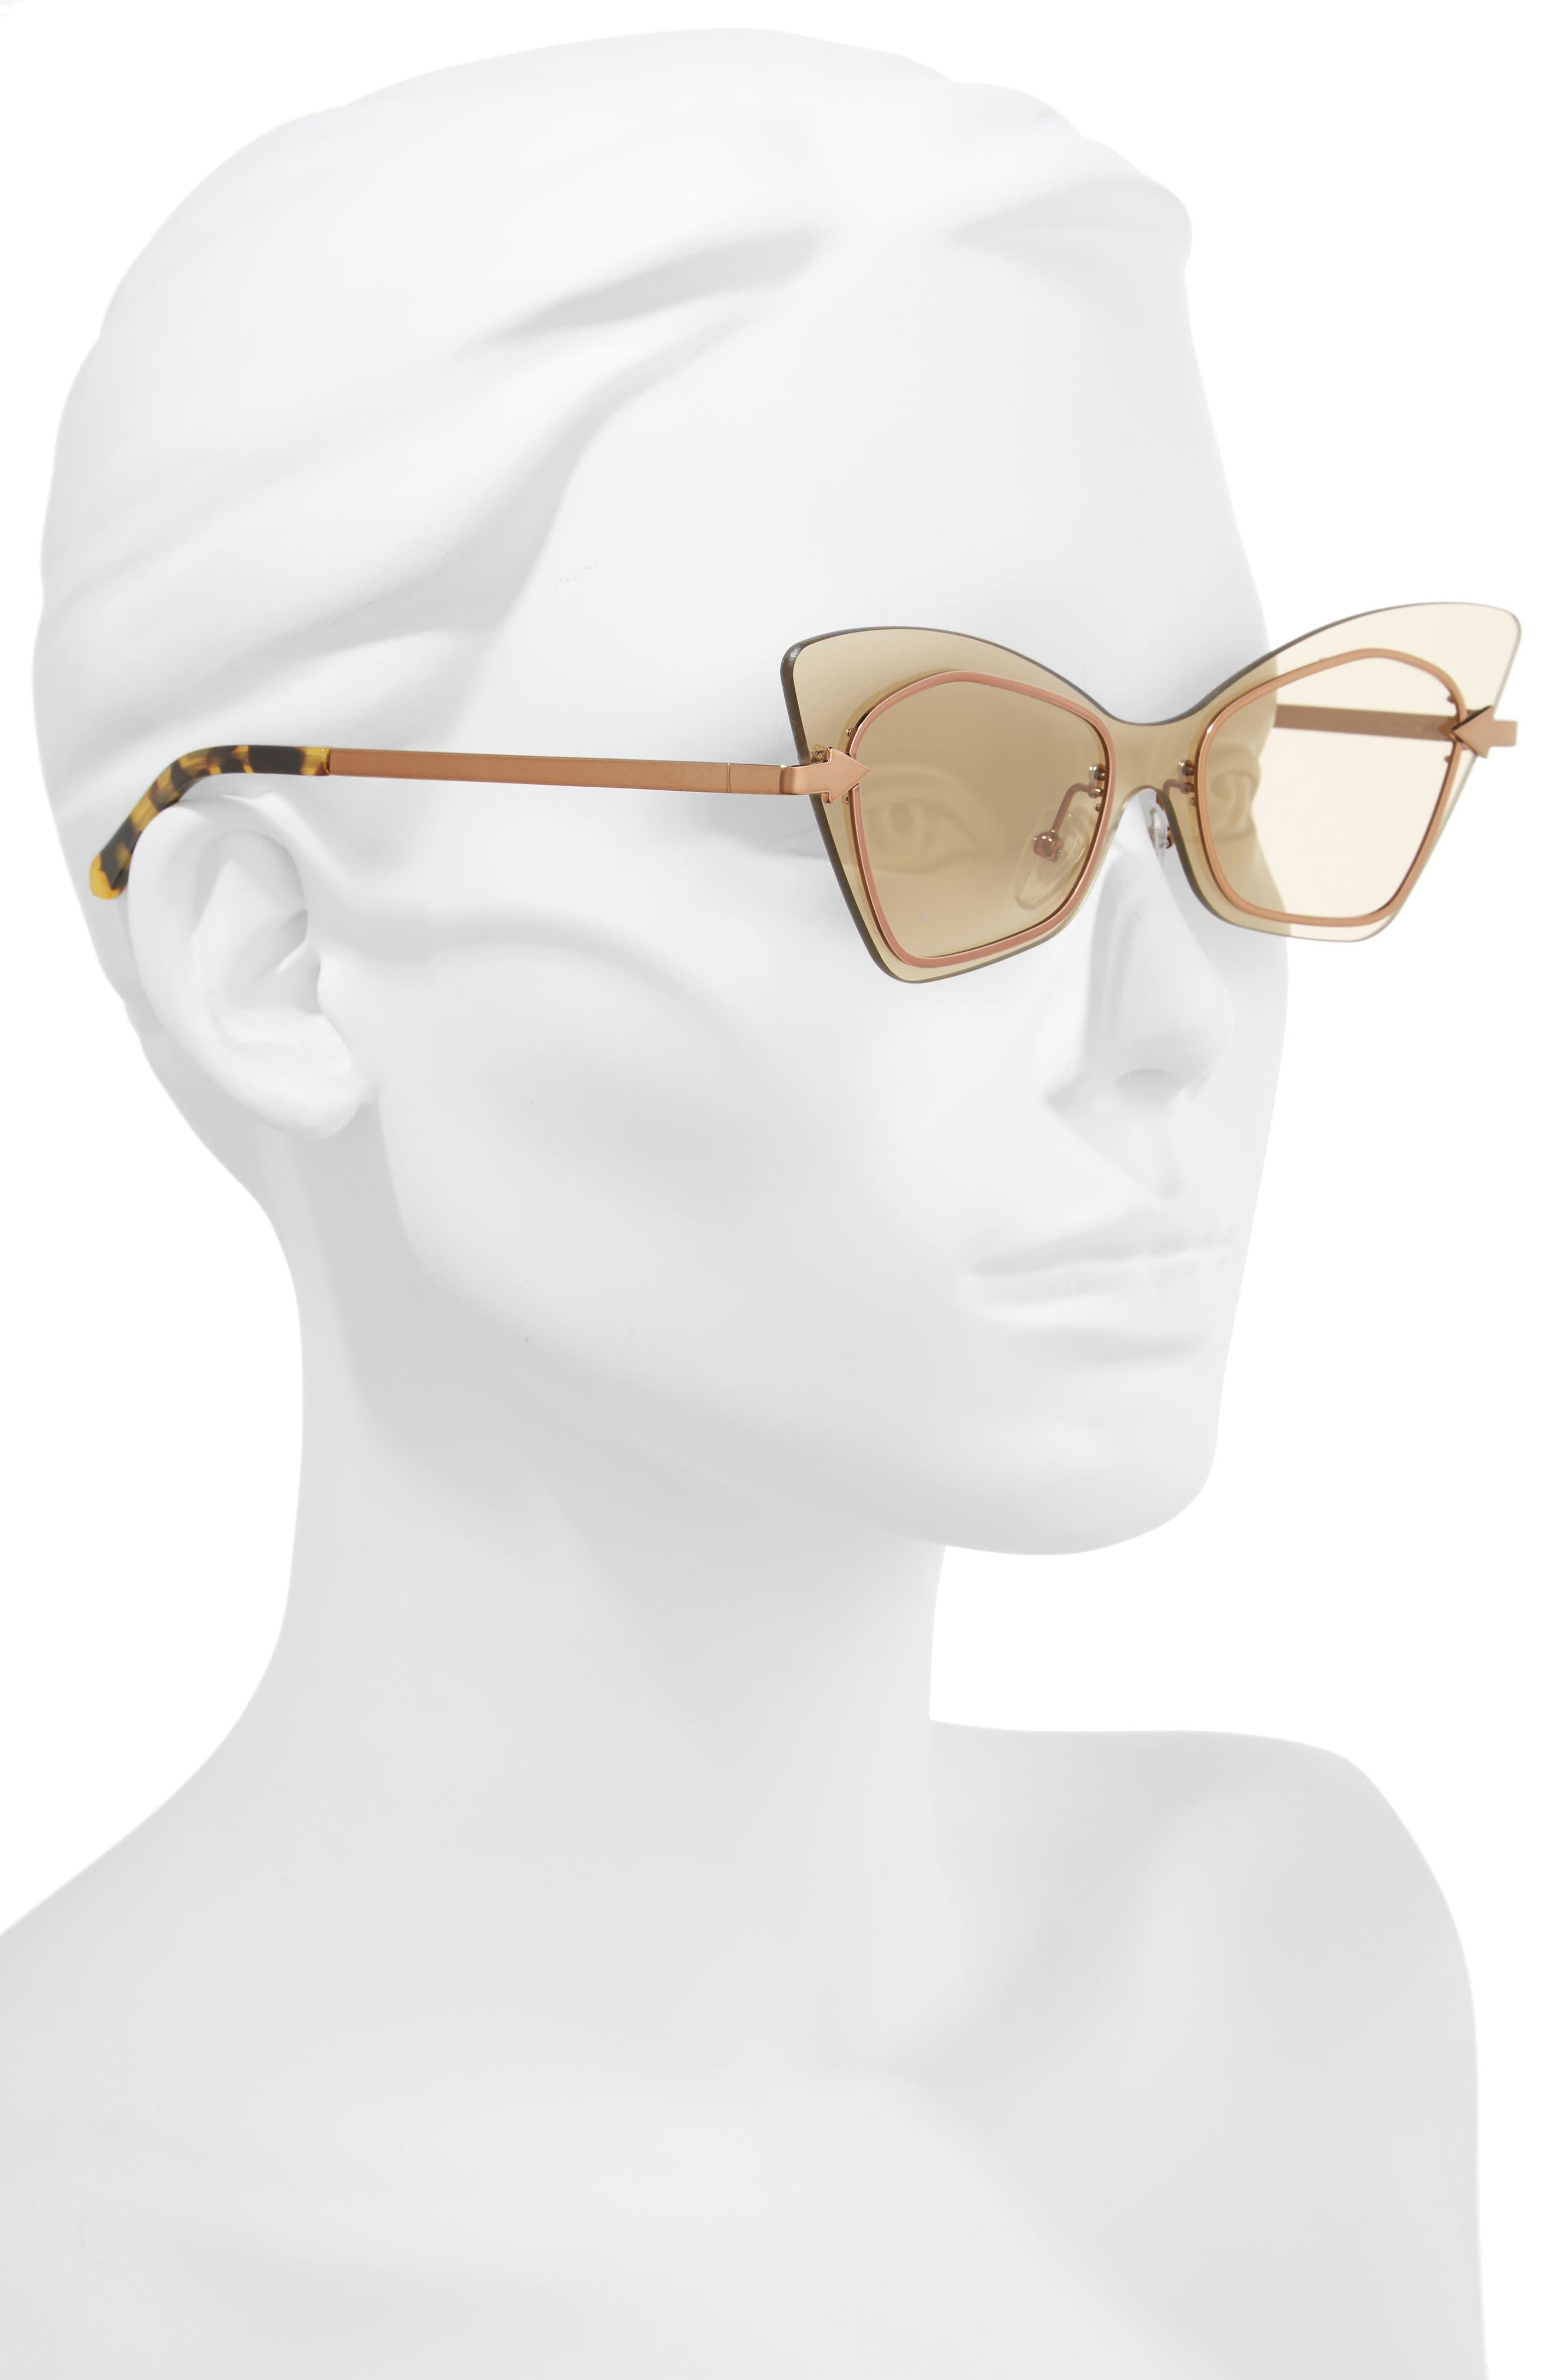 Mrs. Brill 53mm Cat Eye Sunglasses,                             Alternate thumbnail 2, color,                             Crazy Tortoise